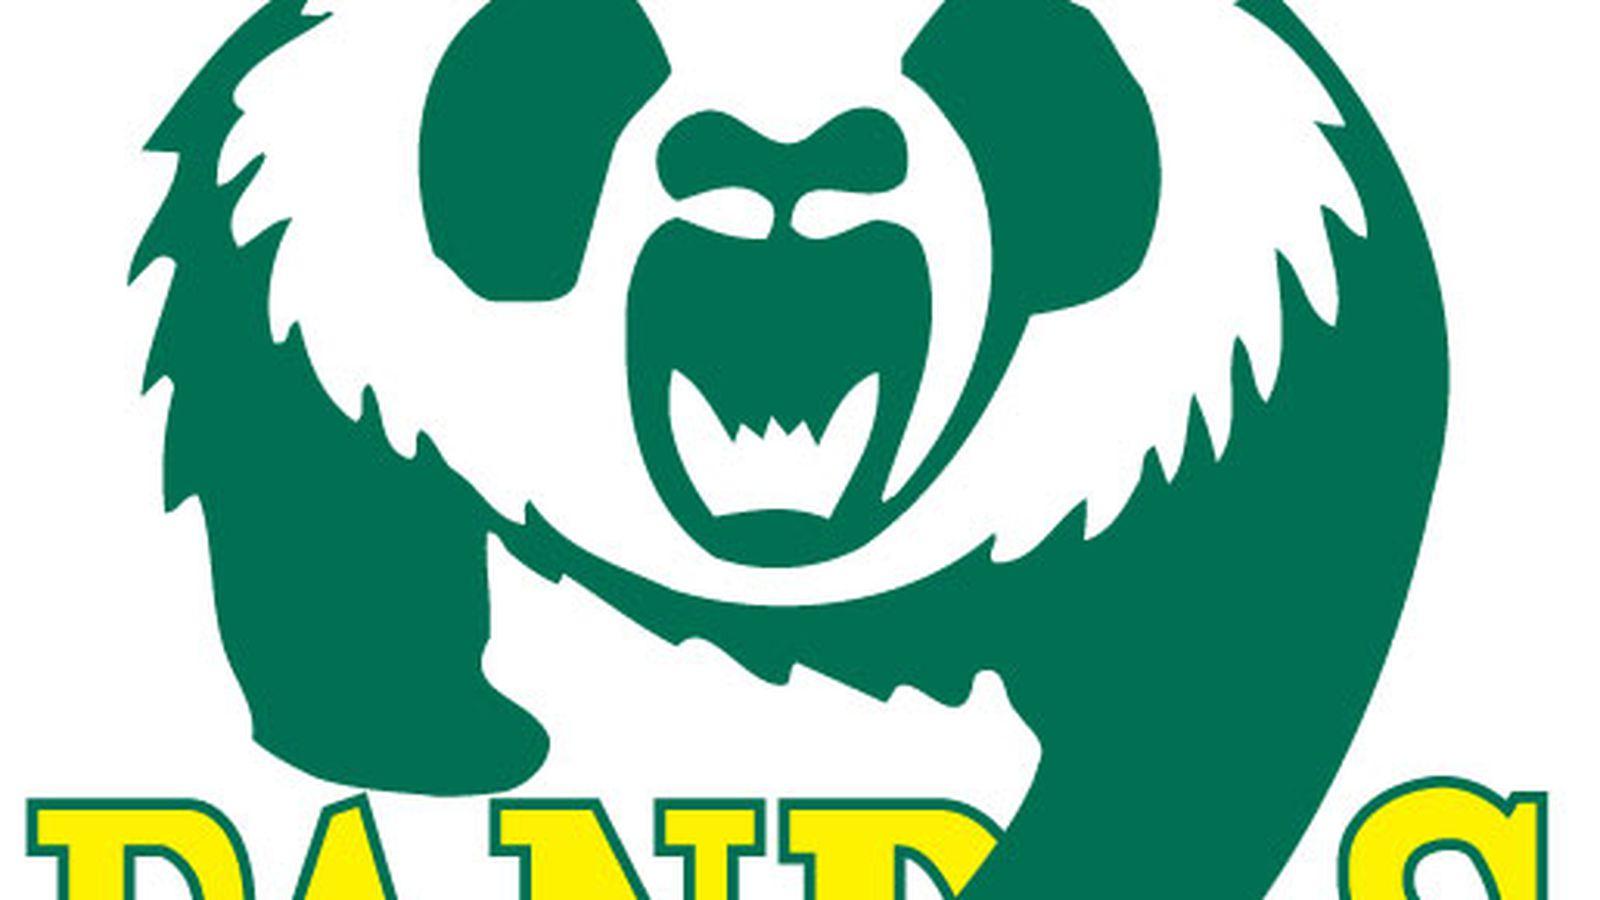 Alberta_pandas_logo.0